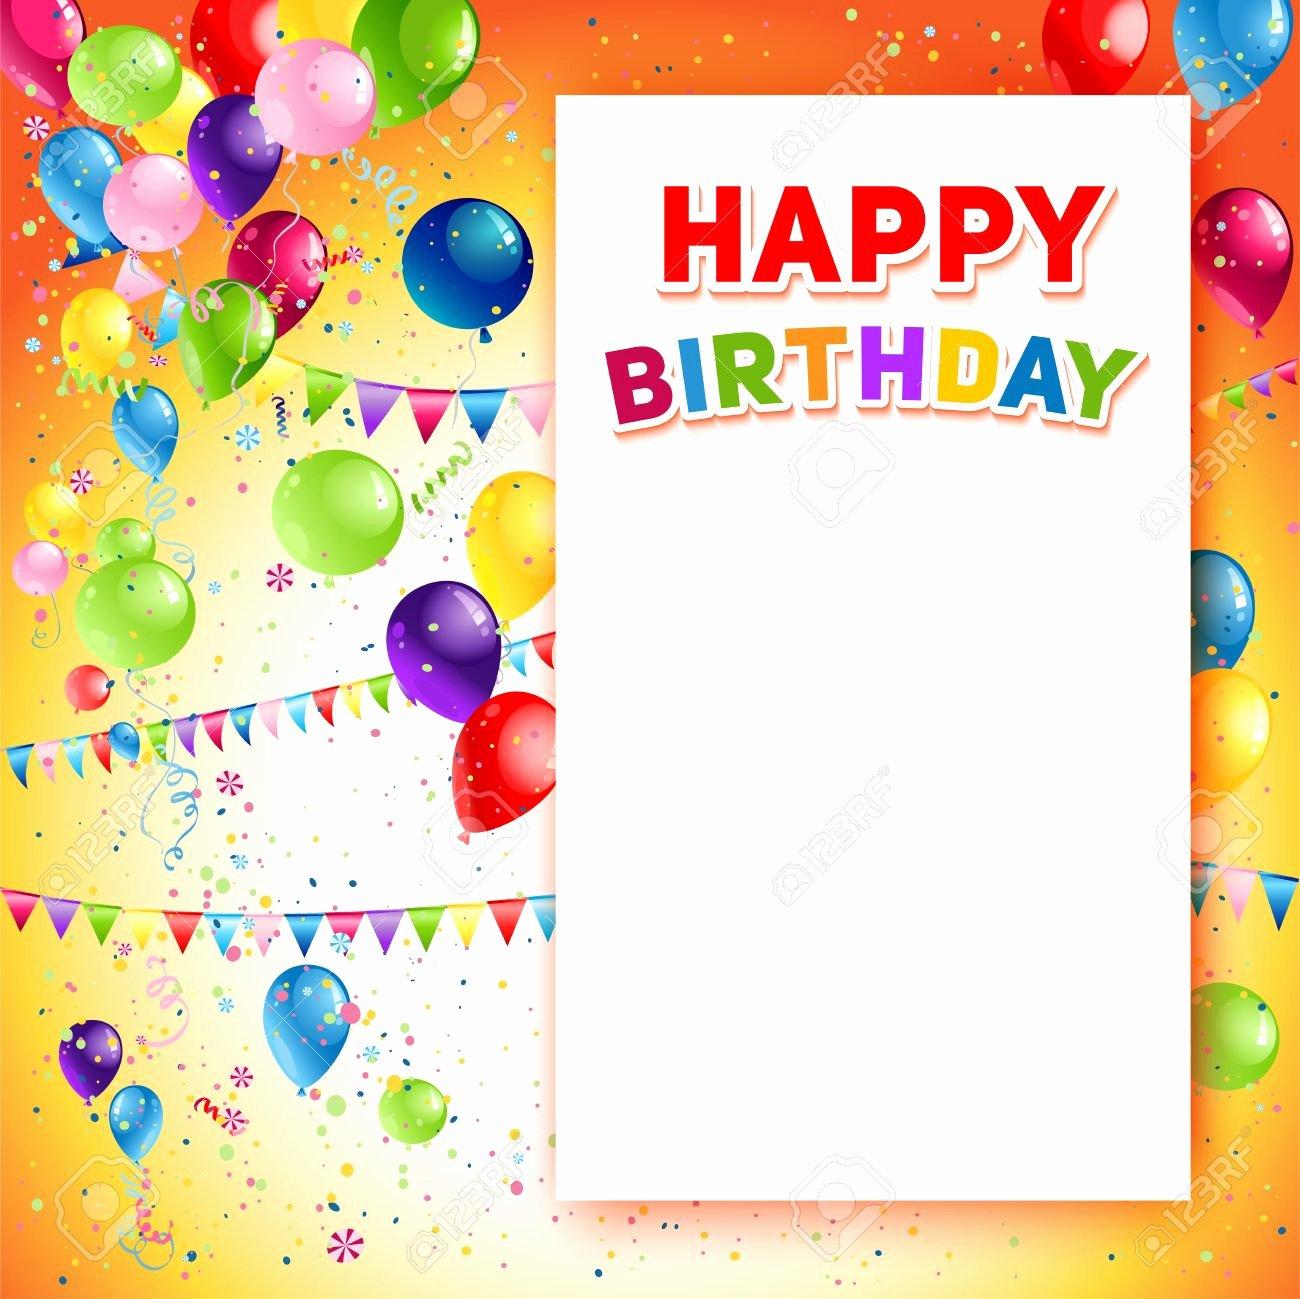 Happy Birthday Banner Template Elegant Birthday Poster Design Template – Best Happy Birthday Wishes